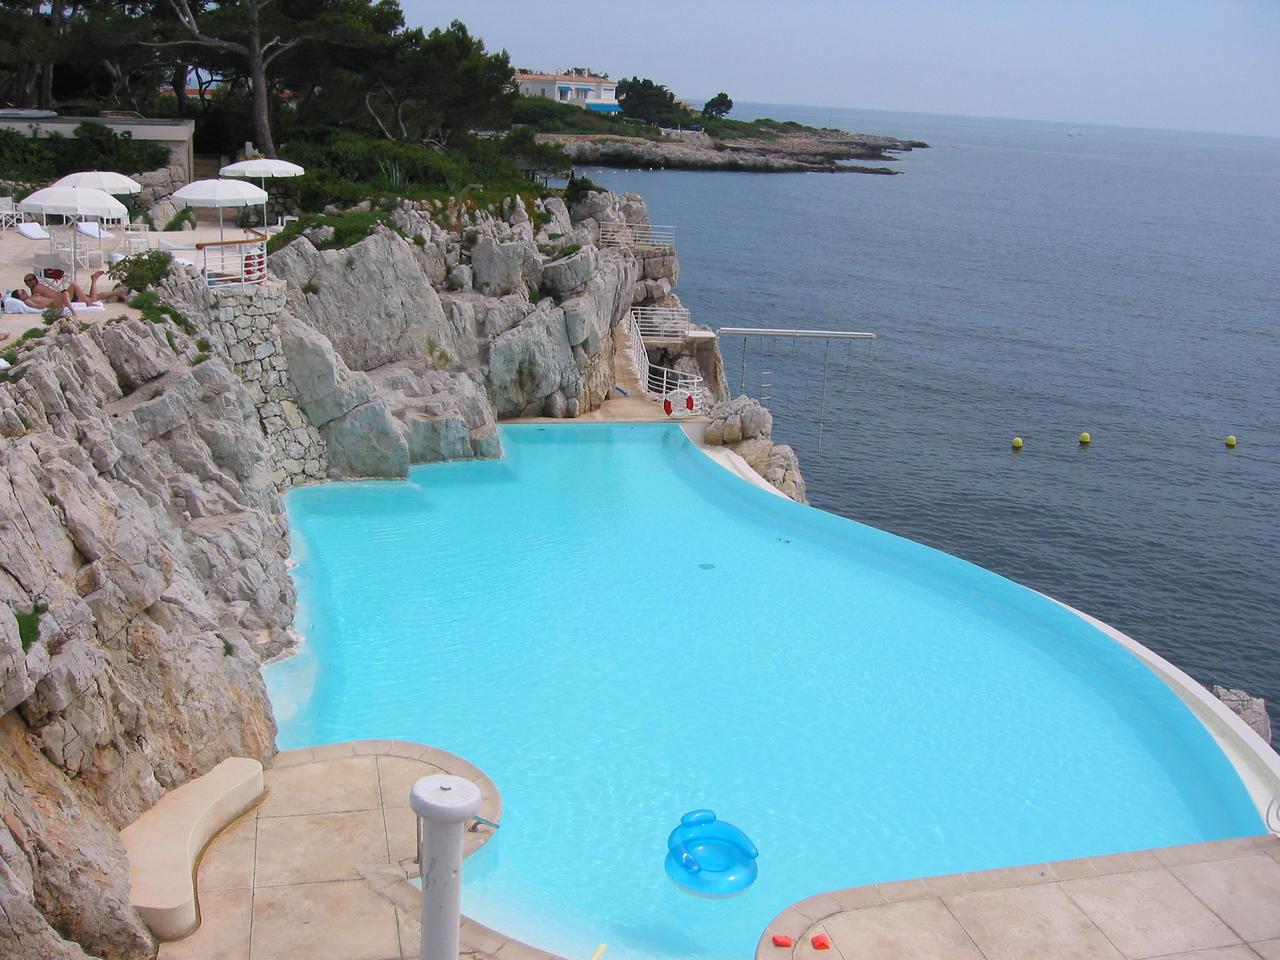 Hotel du Cap salt pool